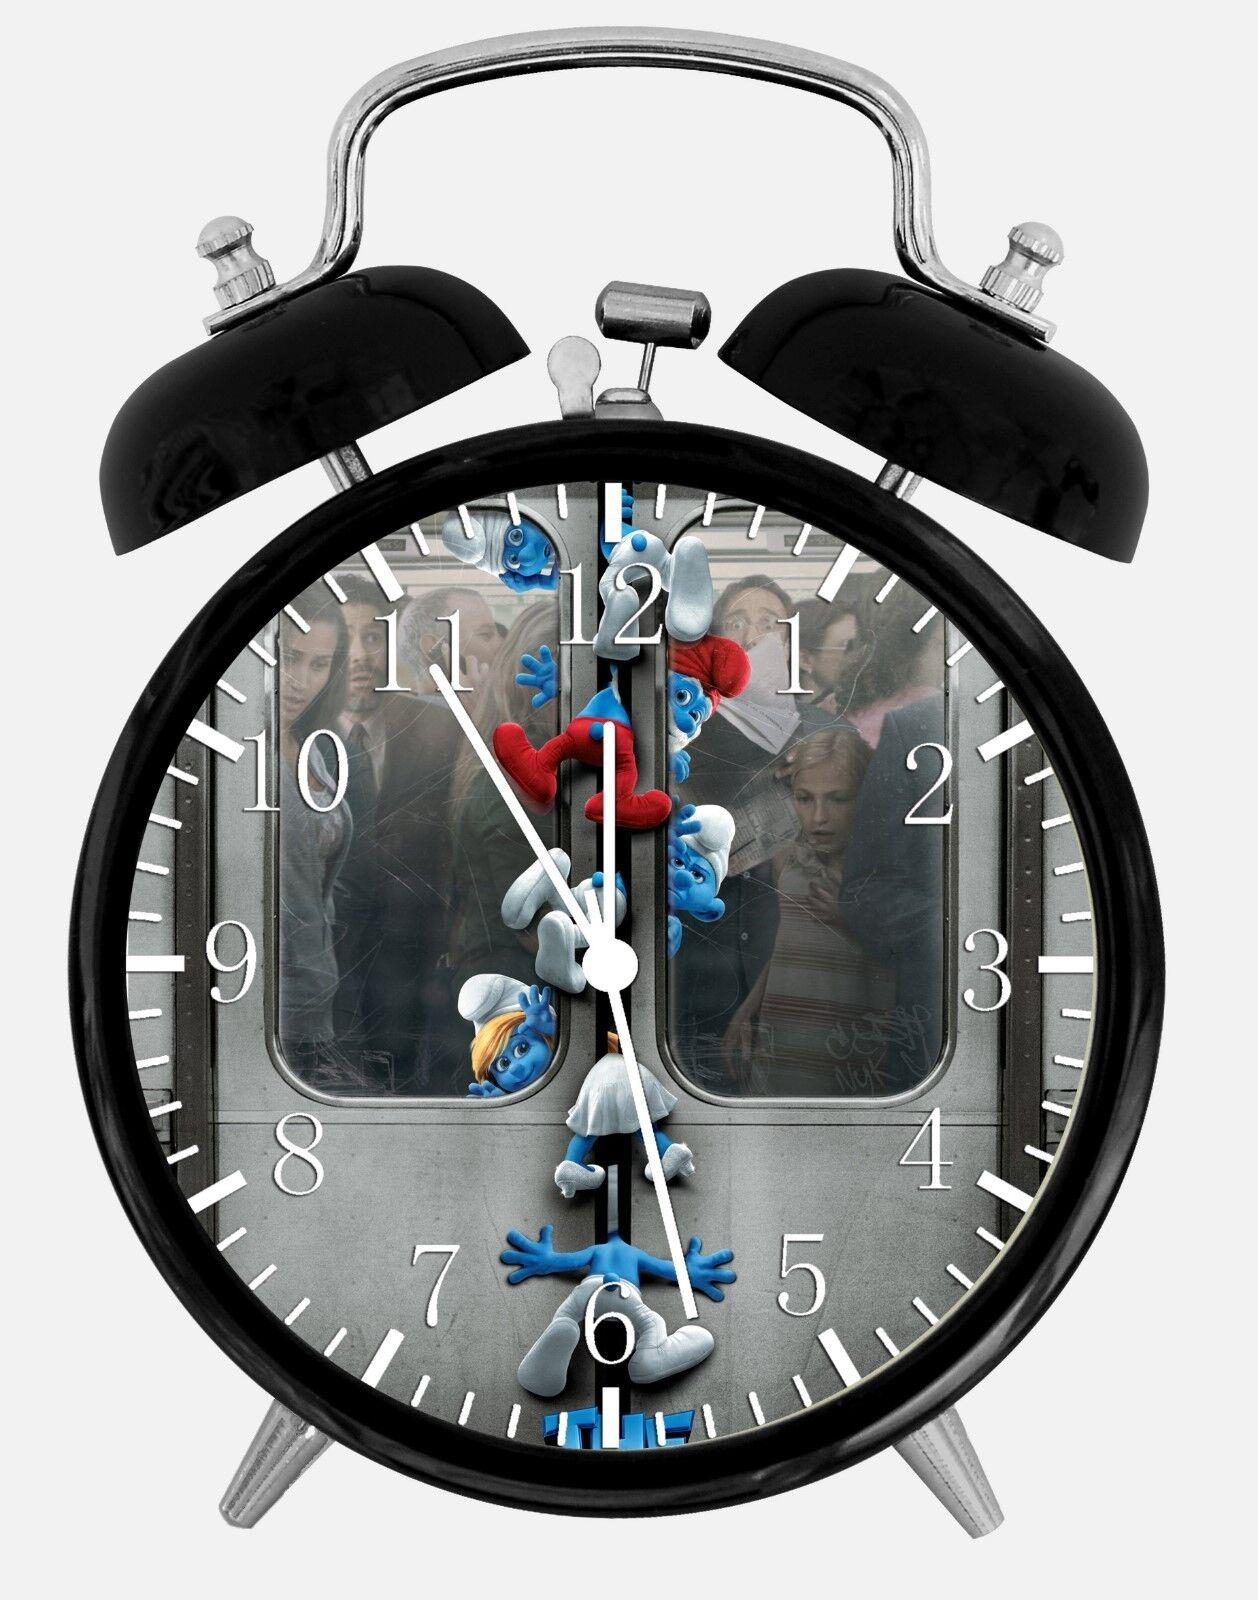 "The Smurfs Alarm Desk Clock 3.75"" Room Office Decor W258 Nice For Gift"